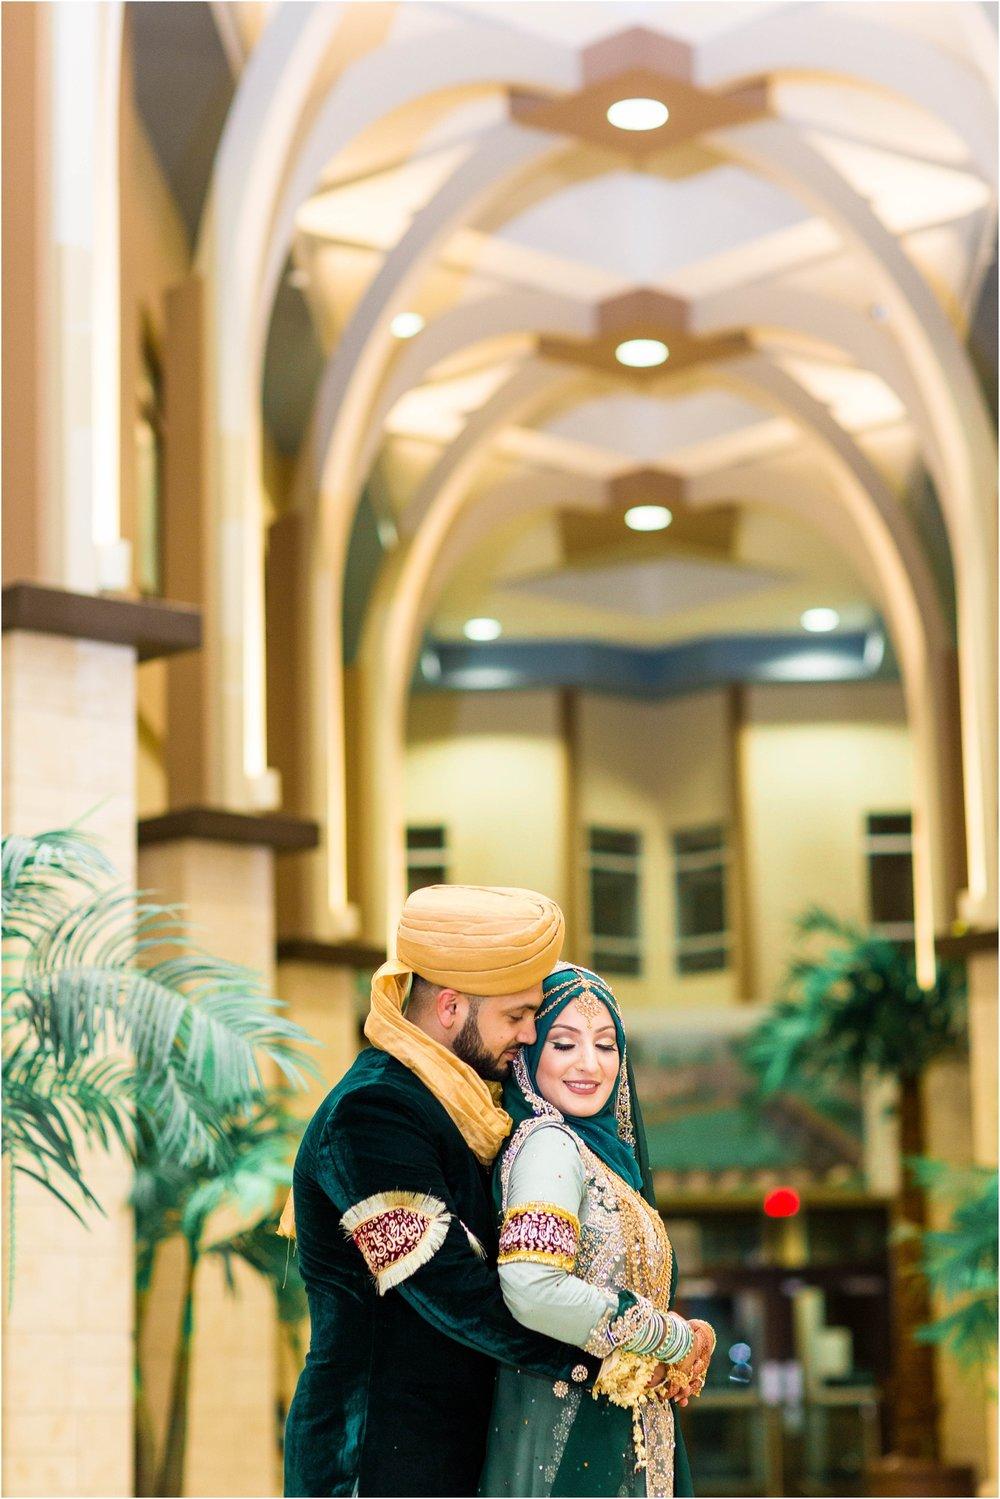 Best-of-2017-Weddings-Toronto-Mississauga-Brampton-Scarborough-GTA-Pakistani-Indian-Wedding-Engagement-Photographer-Photography_0054.jpg